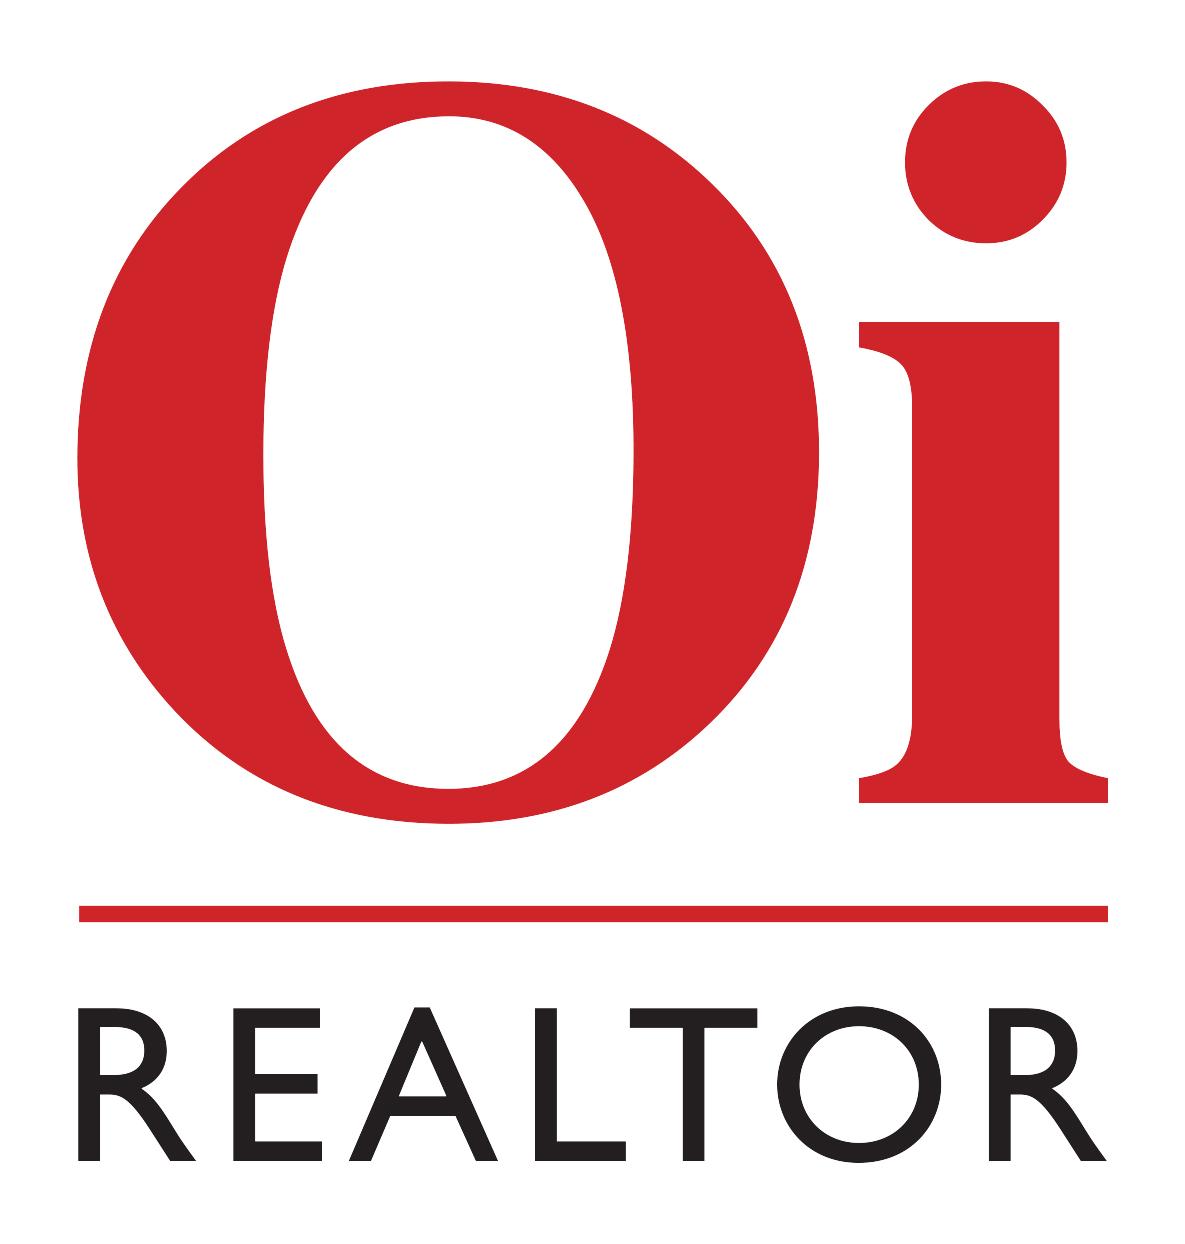 Oi realtor real estate directory oi realtor biocorpaavc